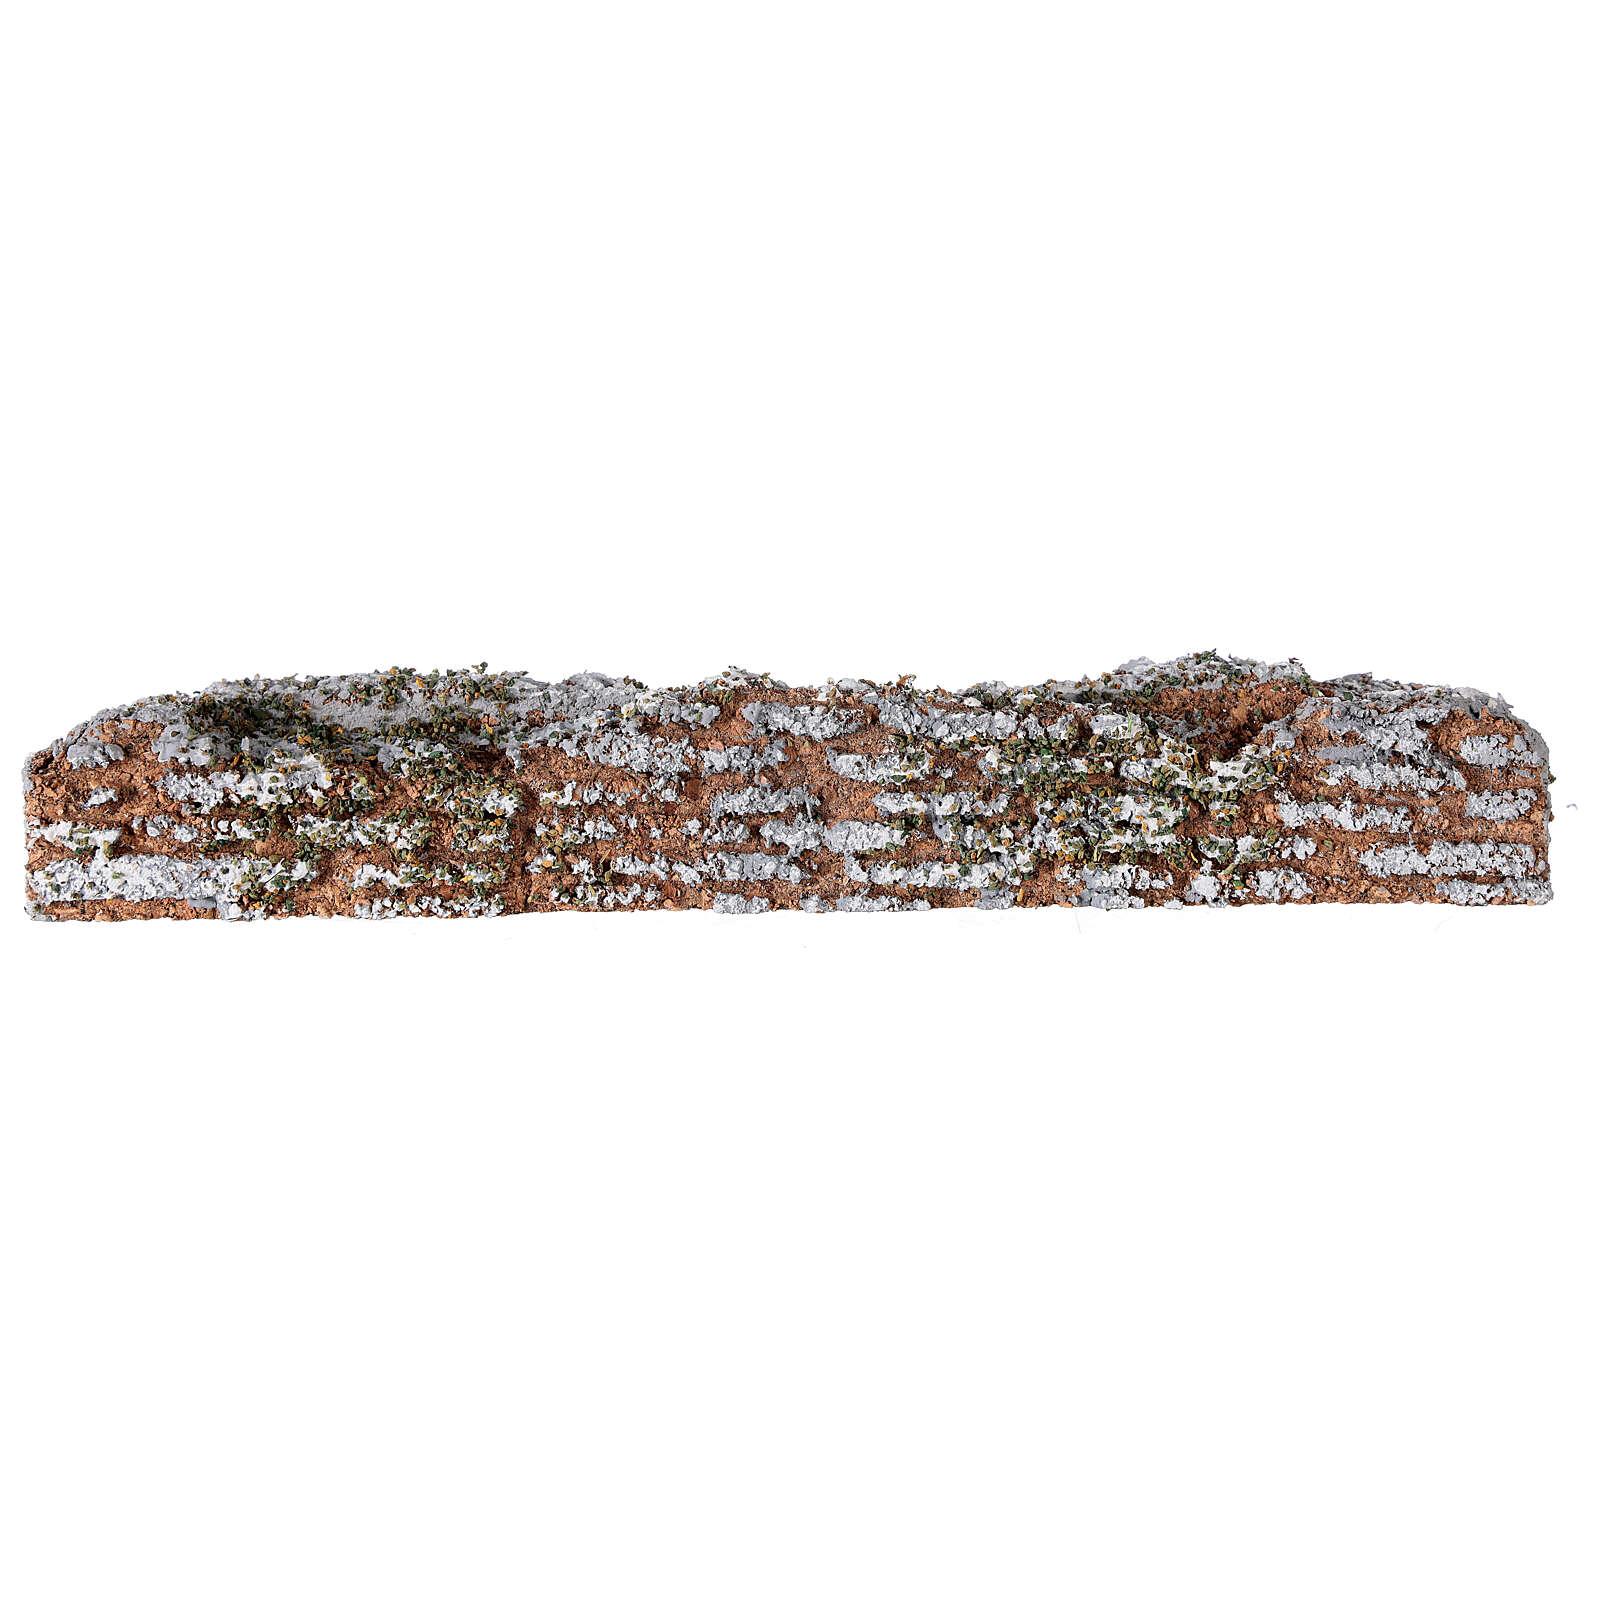 Muretto in sughero per presepe 20 cm 4